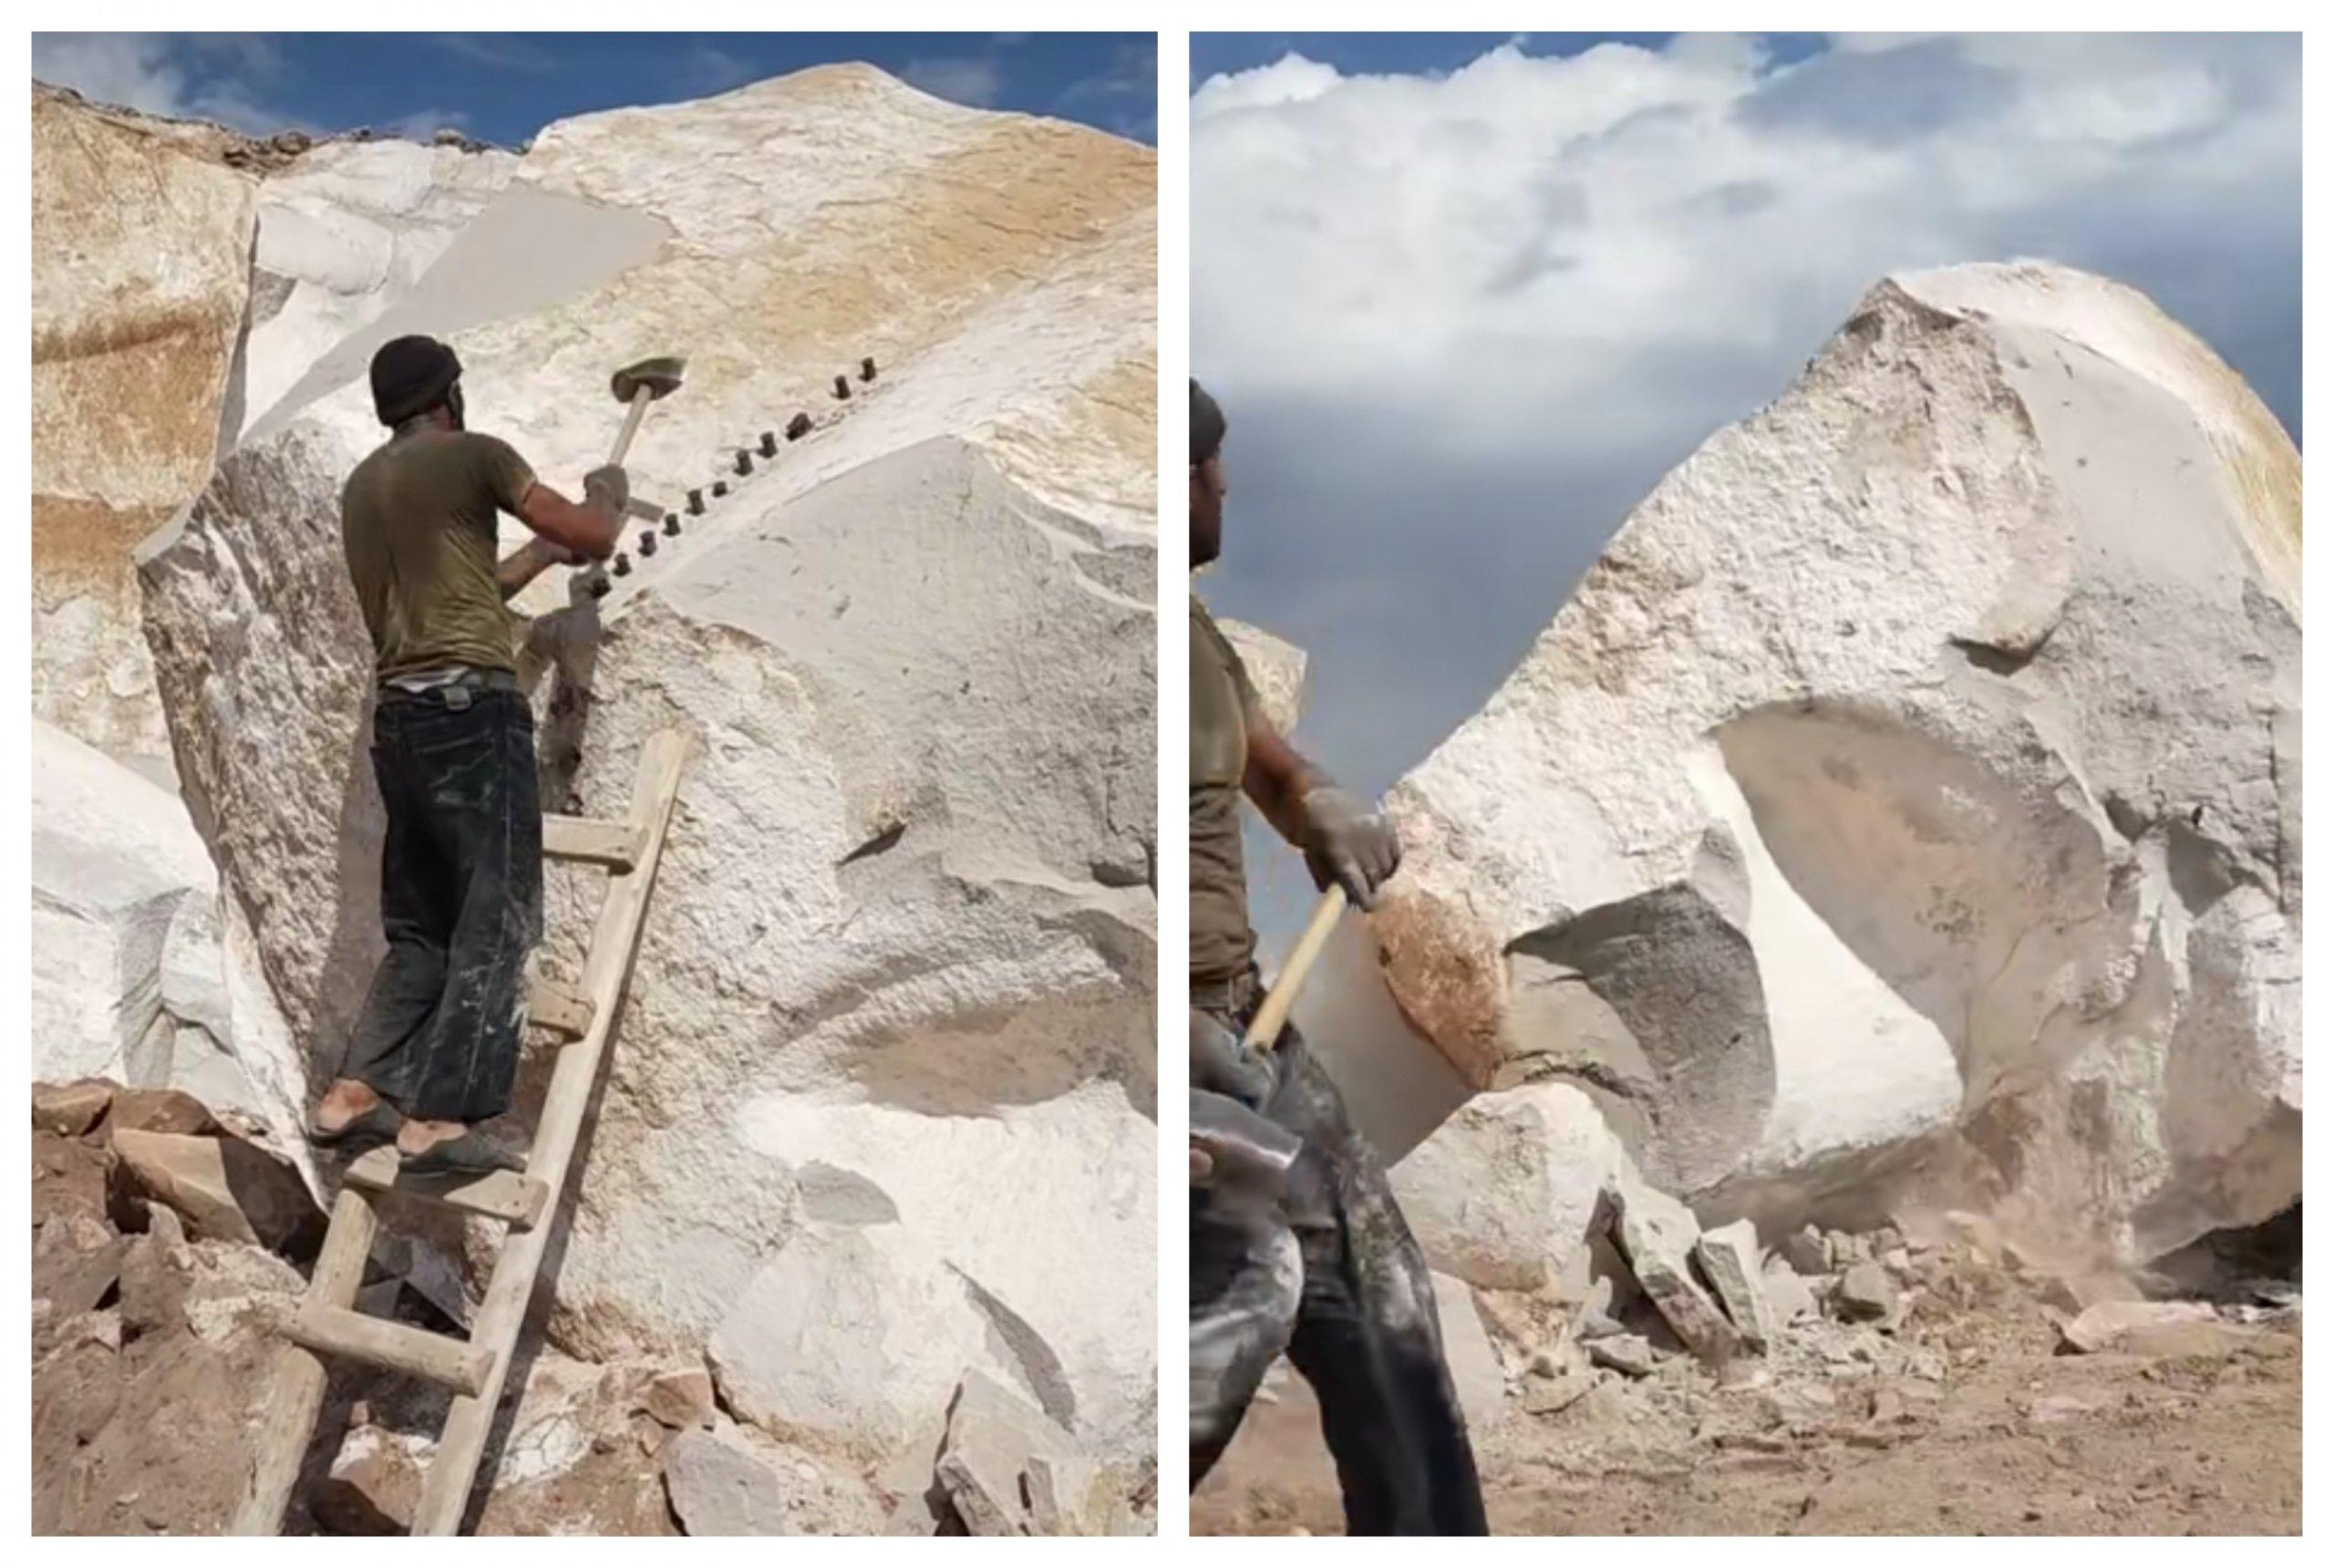 [VIDEO] Kako razbiti kamen na pola s puno pameti i malo znoja